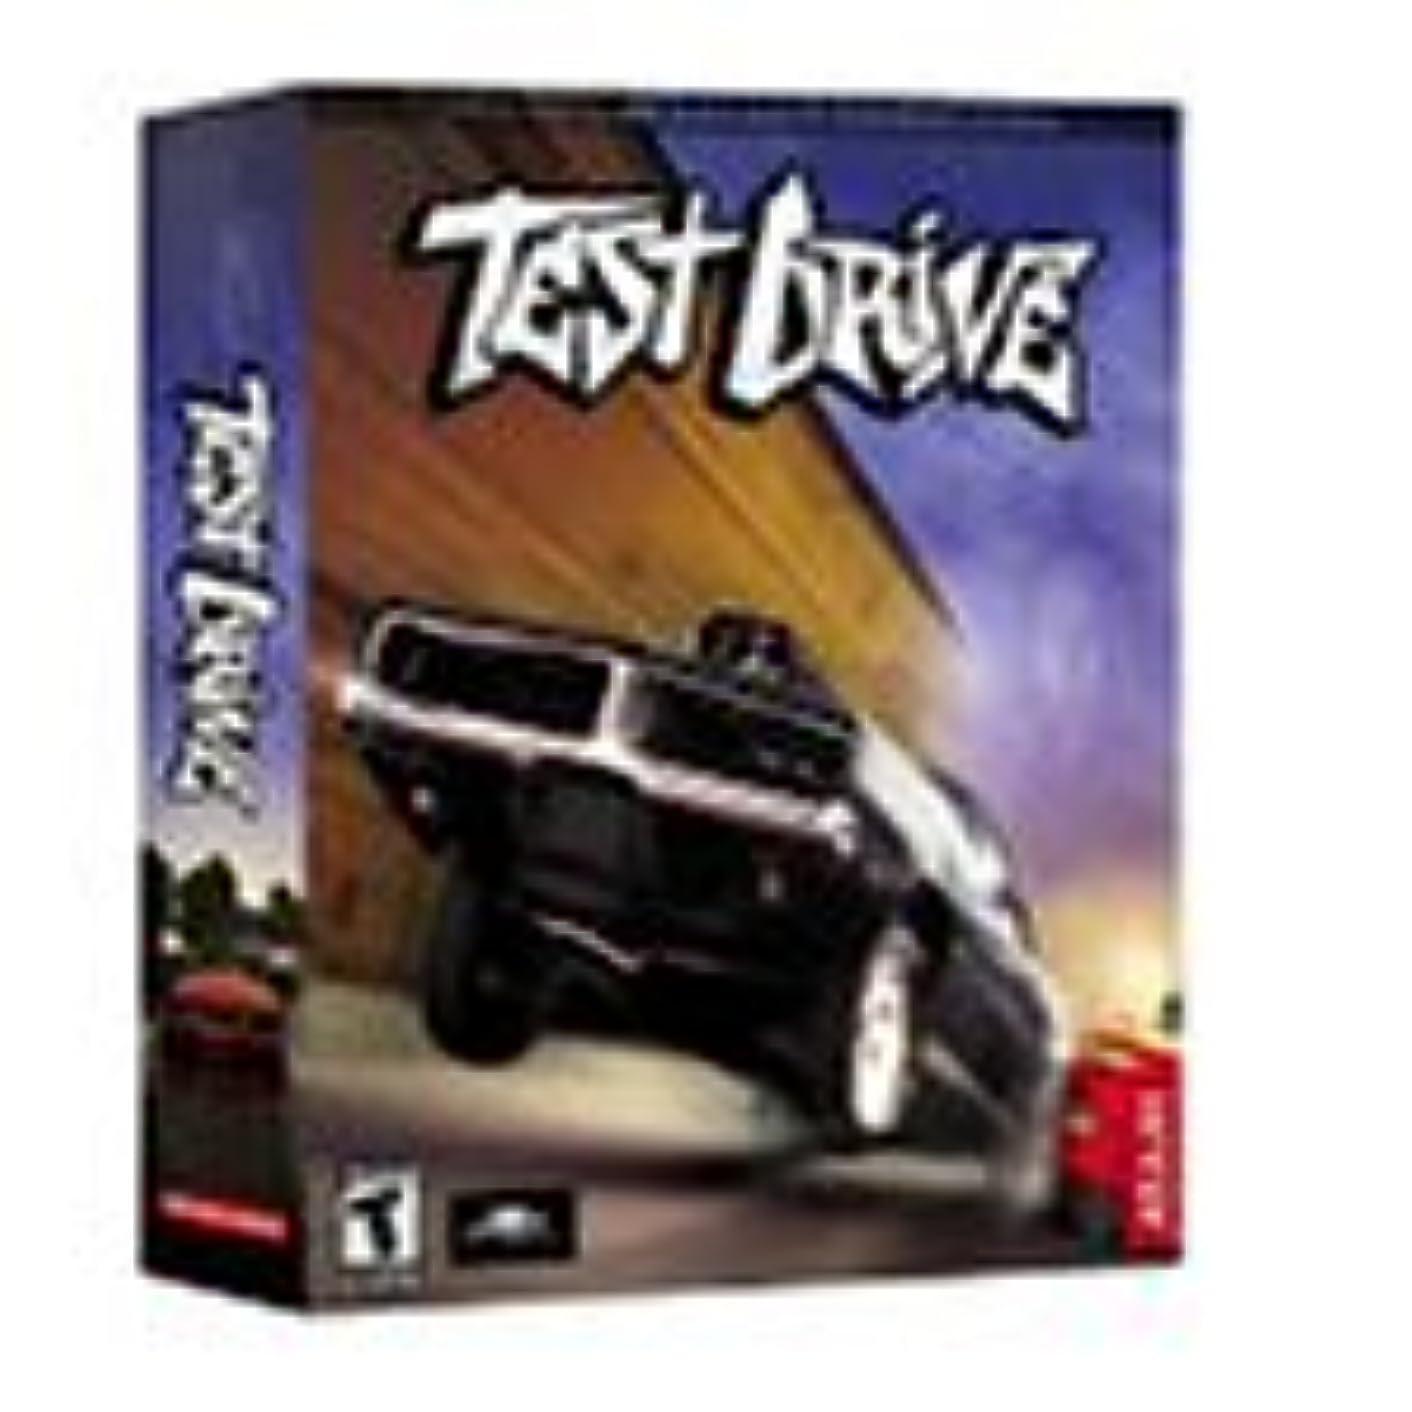 Test Drive (Jewel Case) (輸入版)